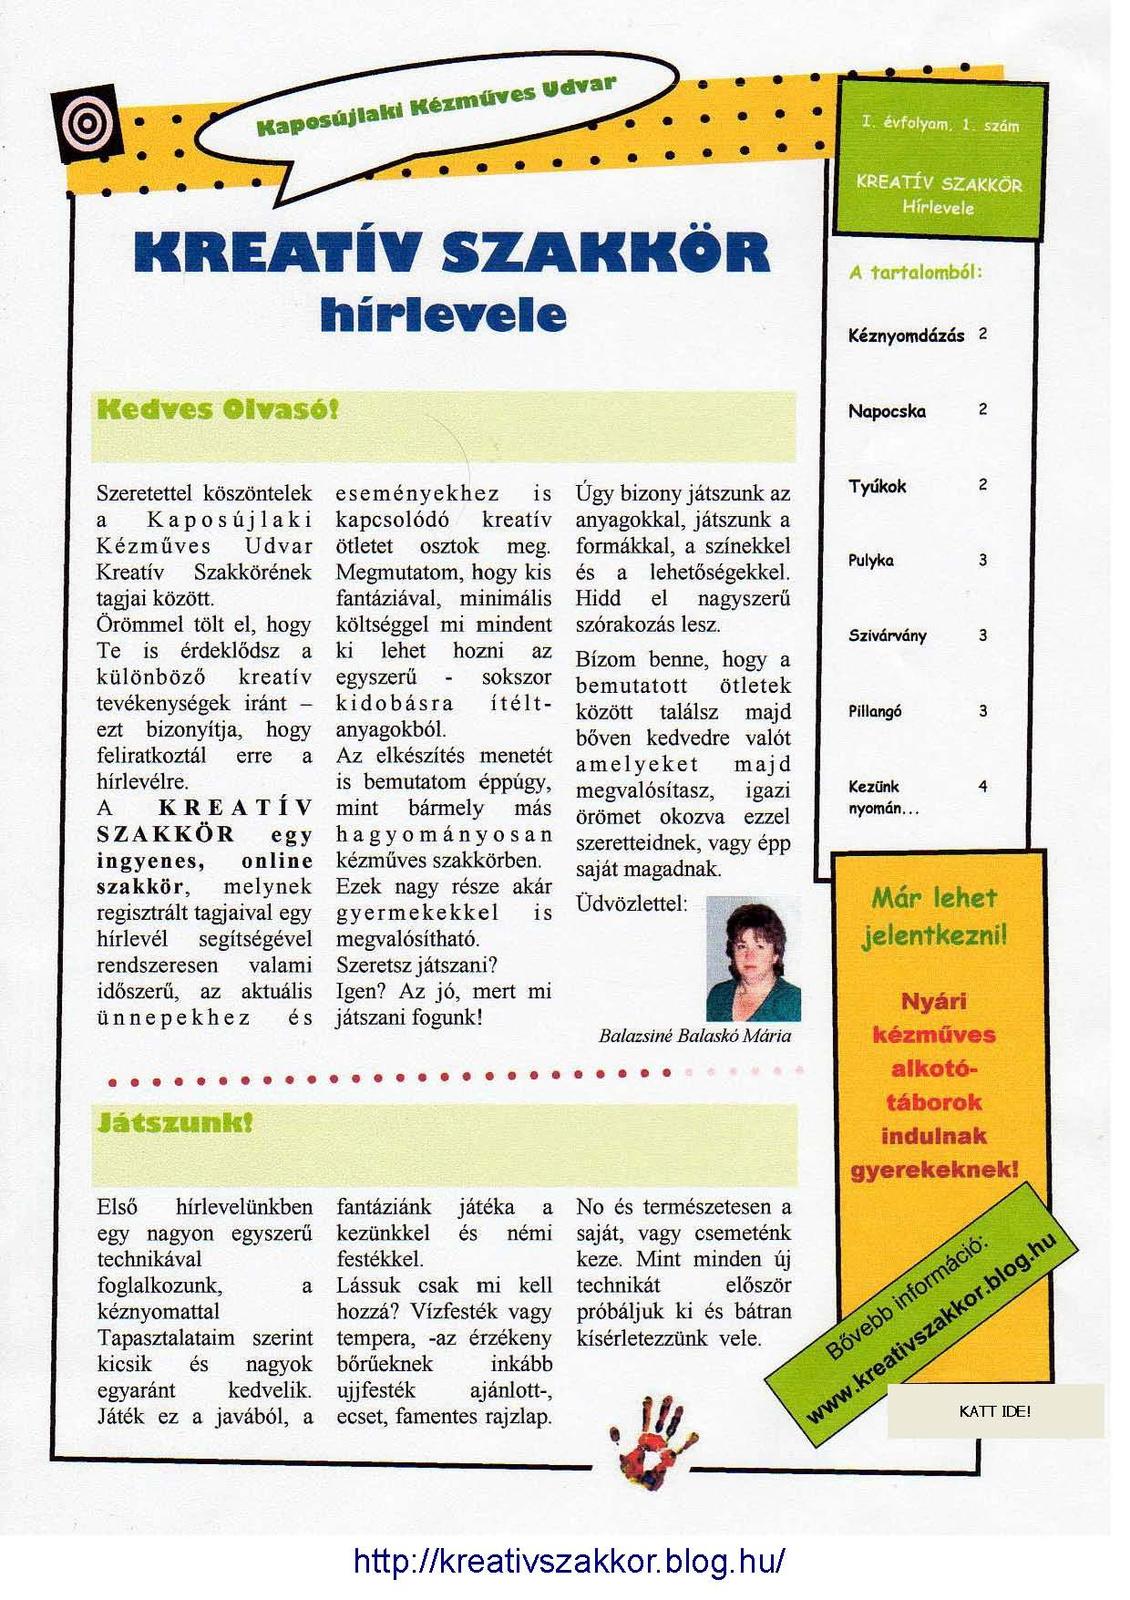 B.B.M: KREATÍV SZAKKÖR Hírlevele 1-1 Page 1